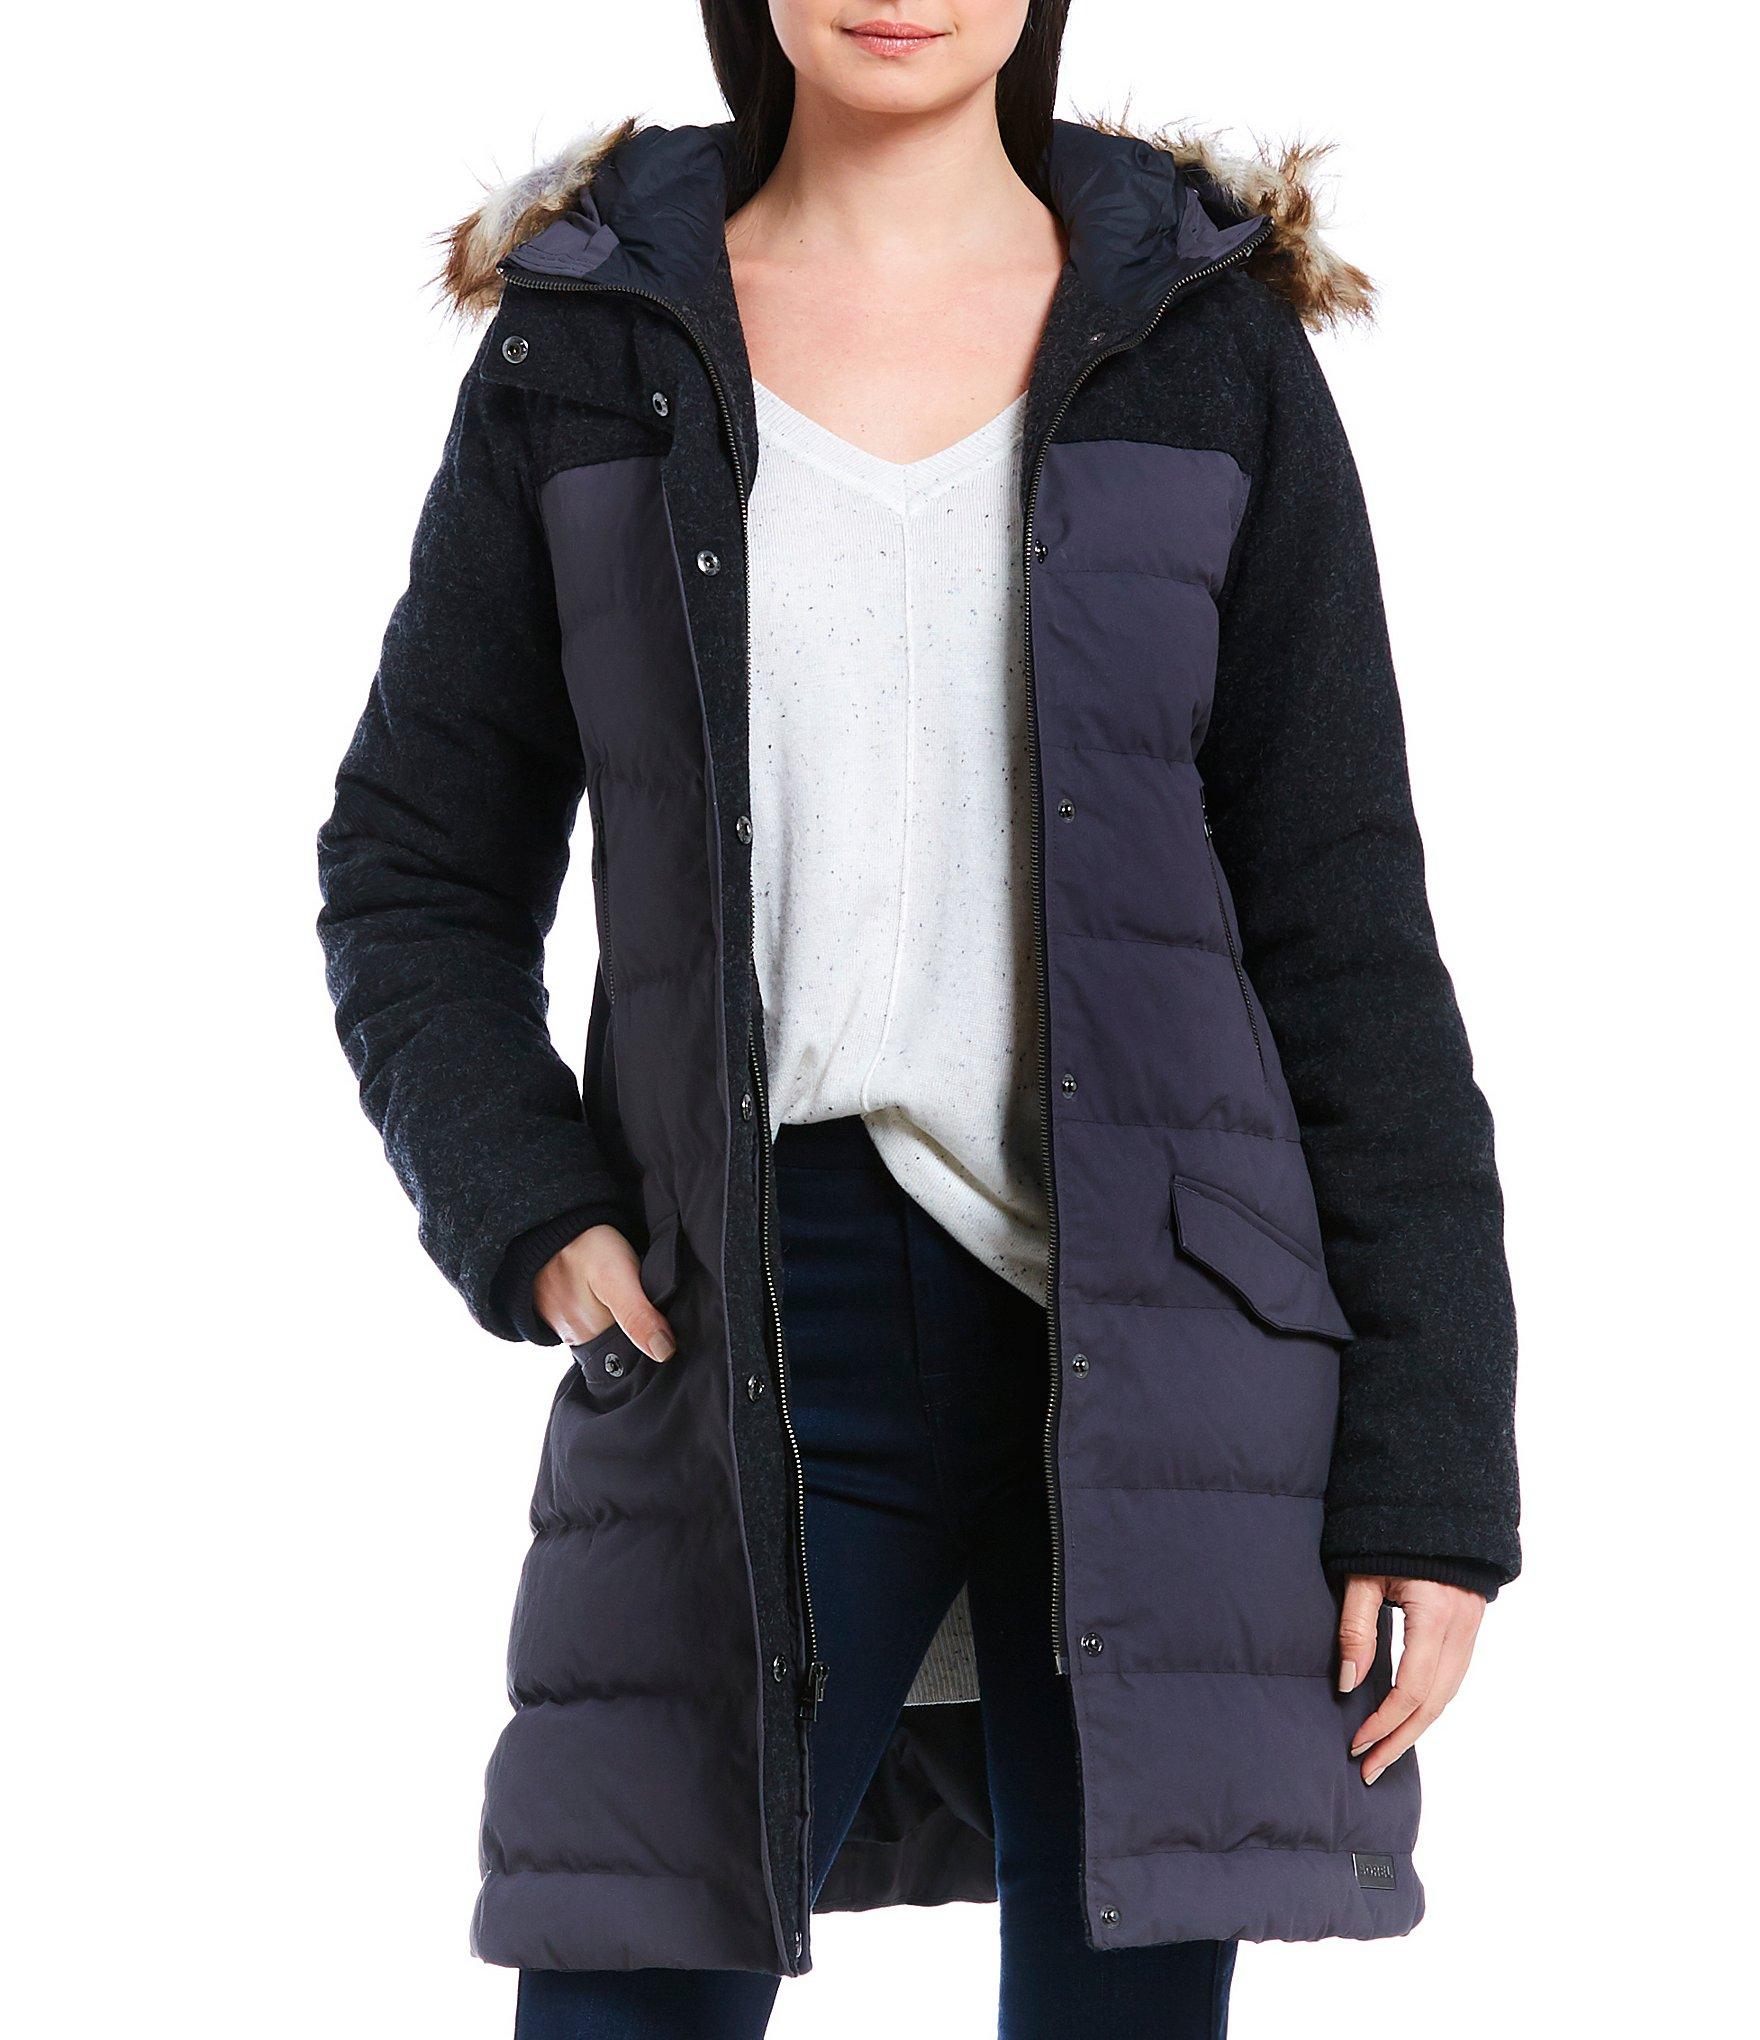 Theory women's down jacket